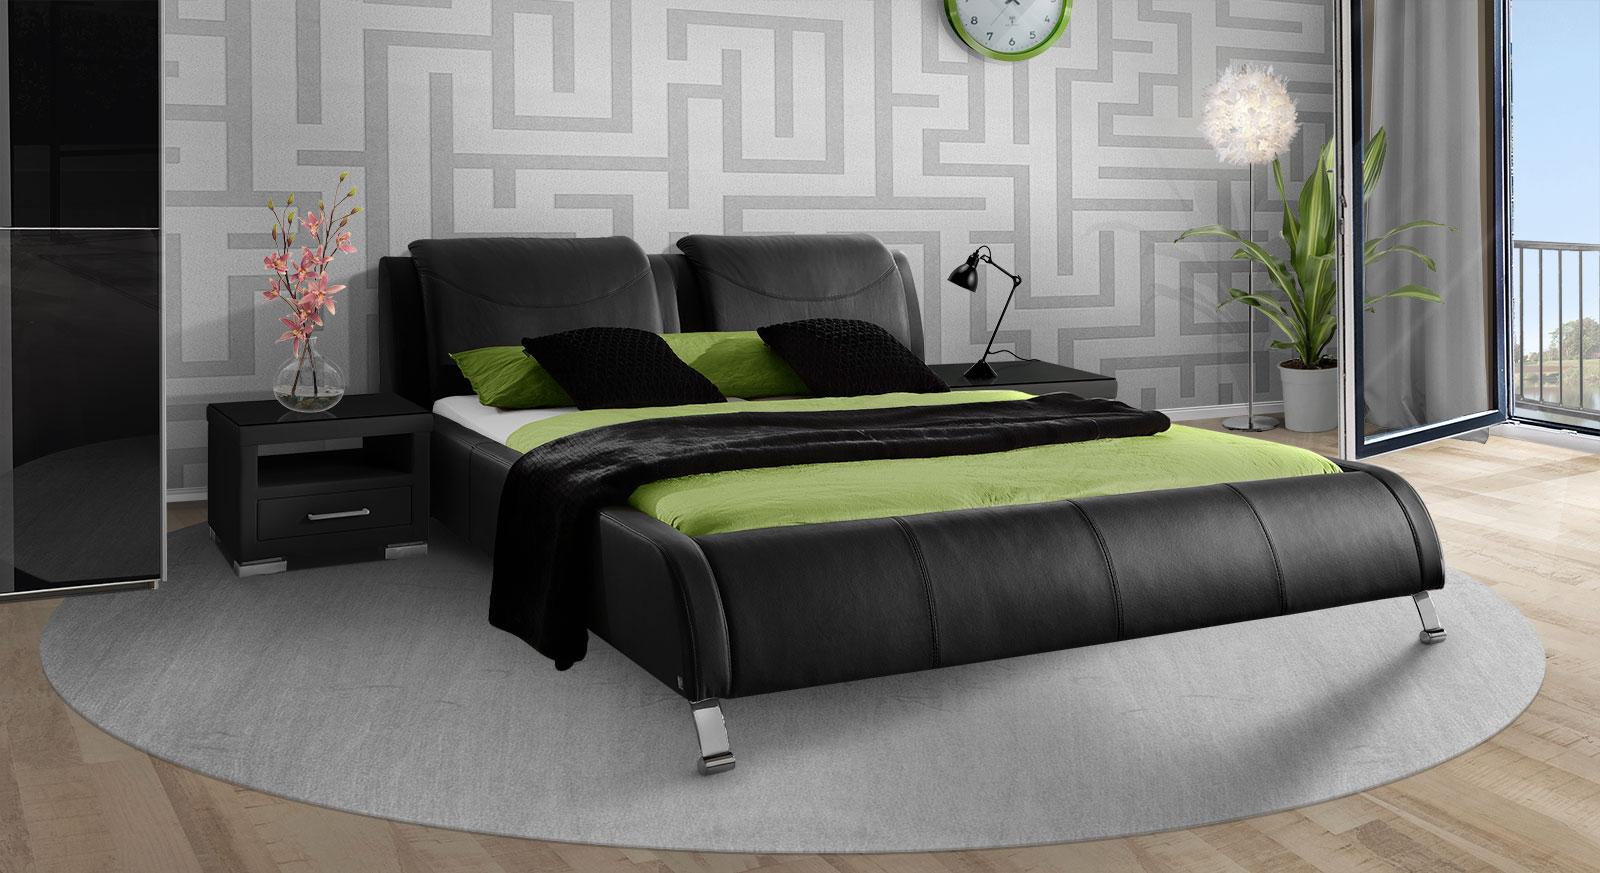 Modernes Polsterbett Coventry aus schwarzem Echtleder